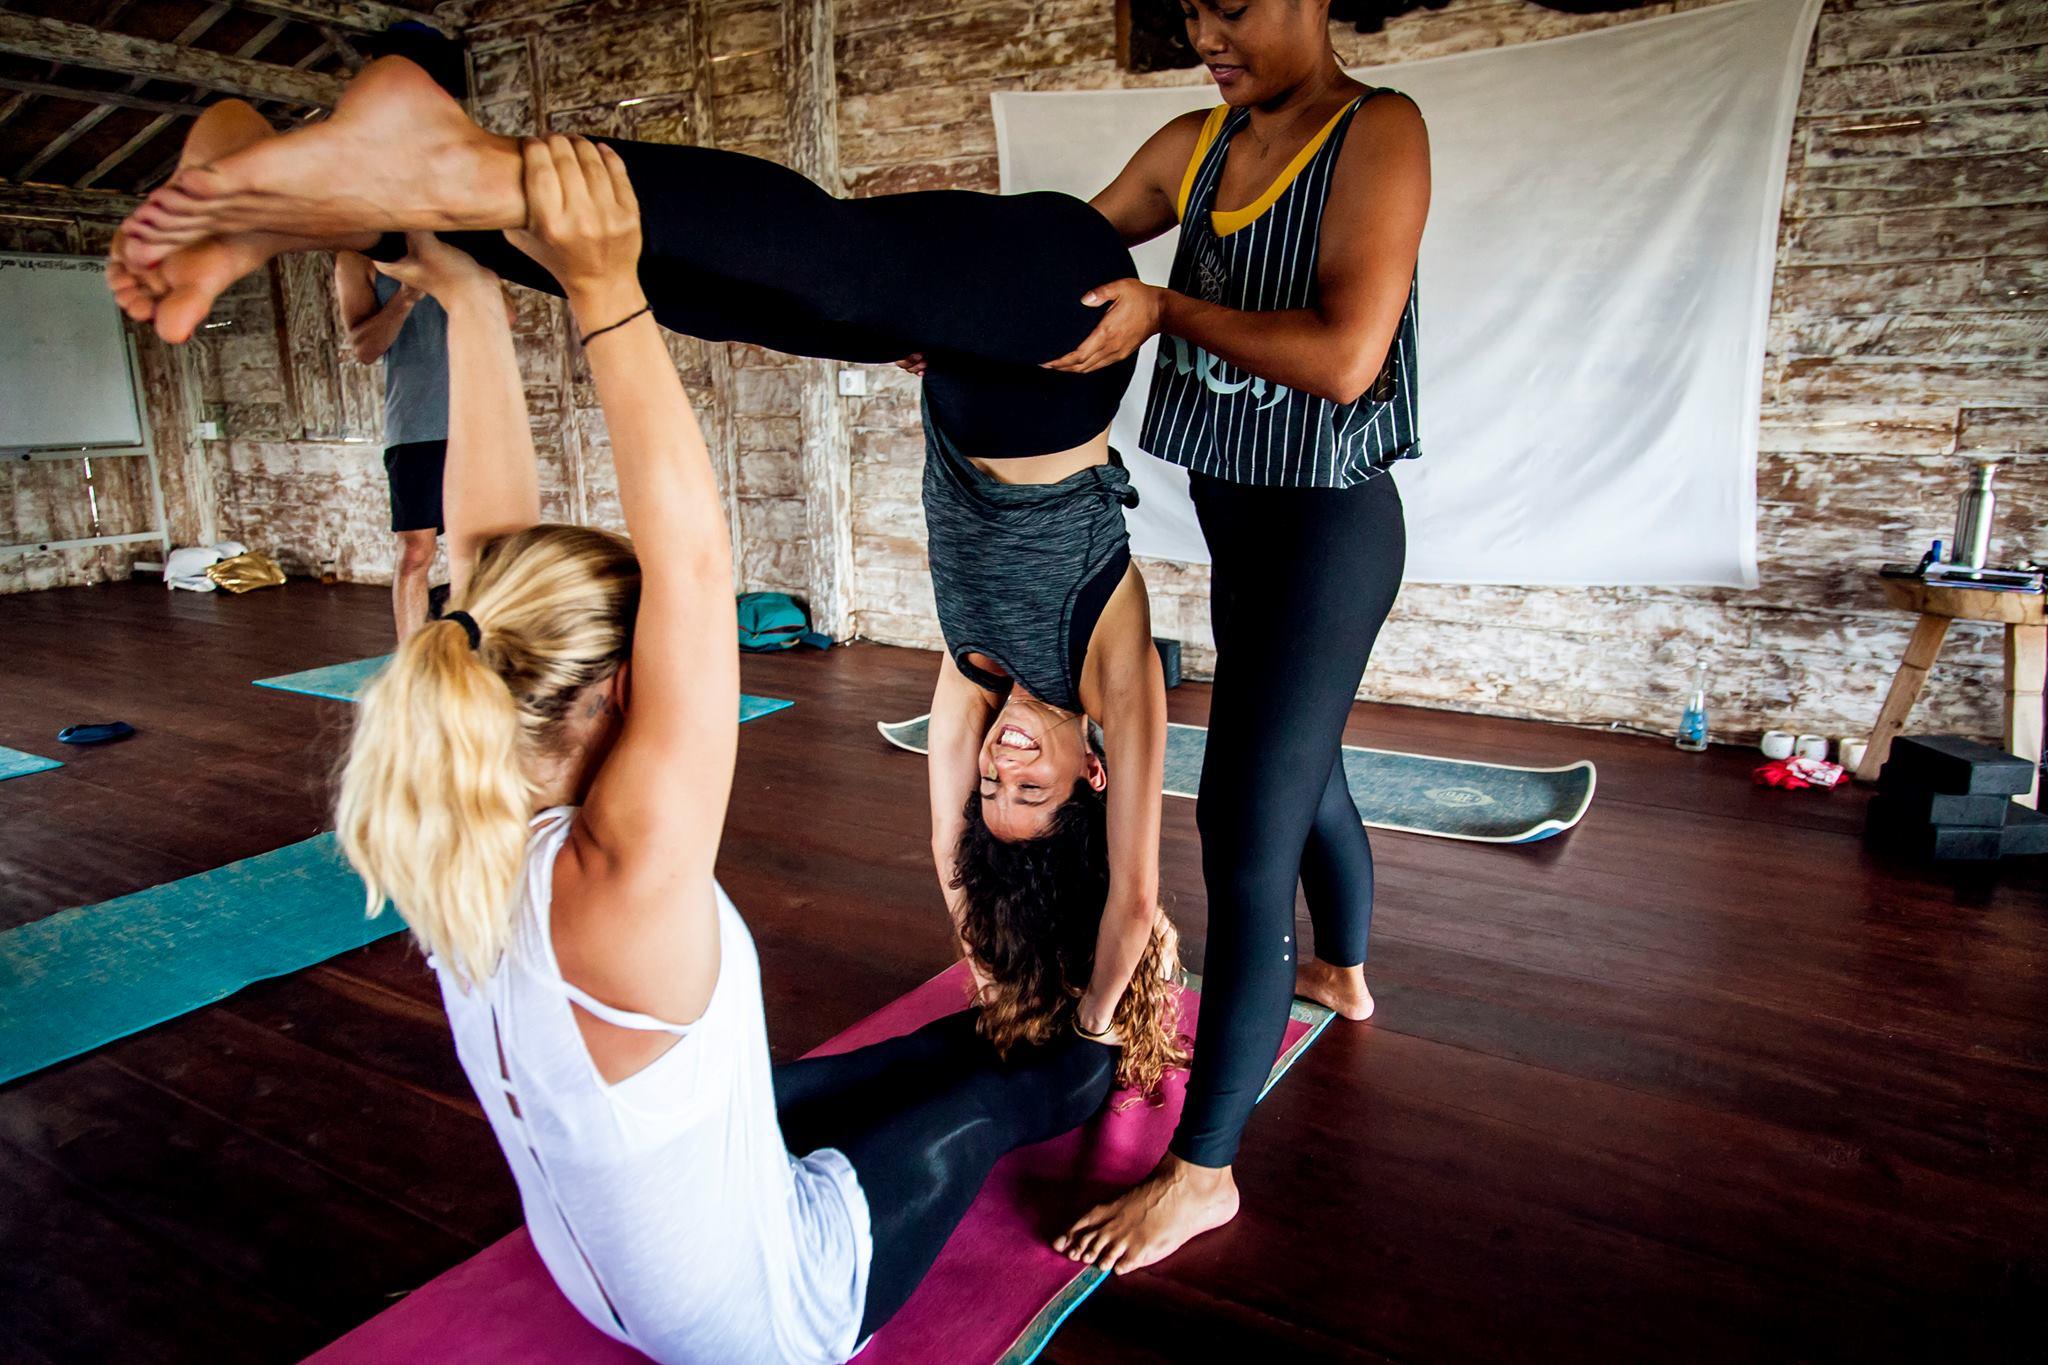 compte rendu de ma formation de 200hrs de yoga a Bali 4